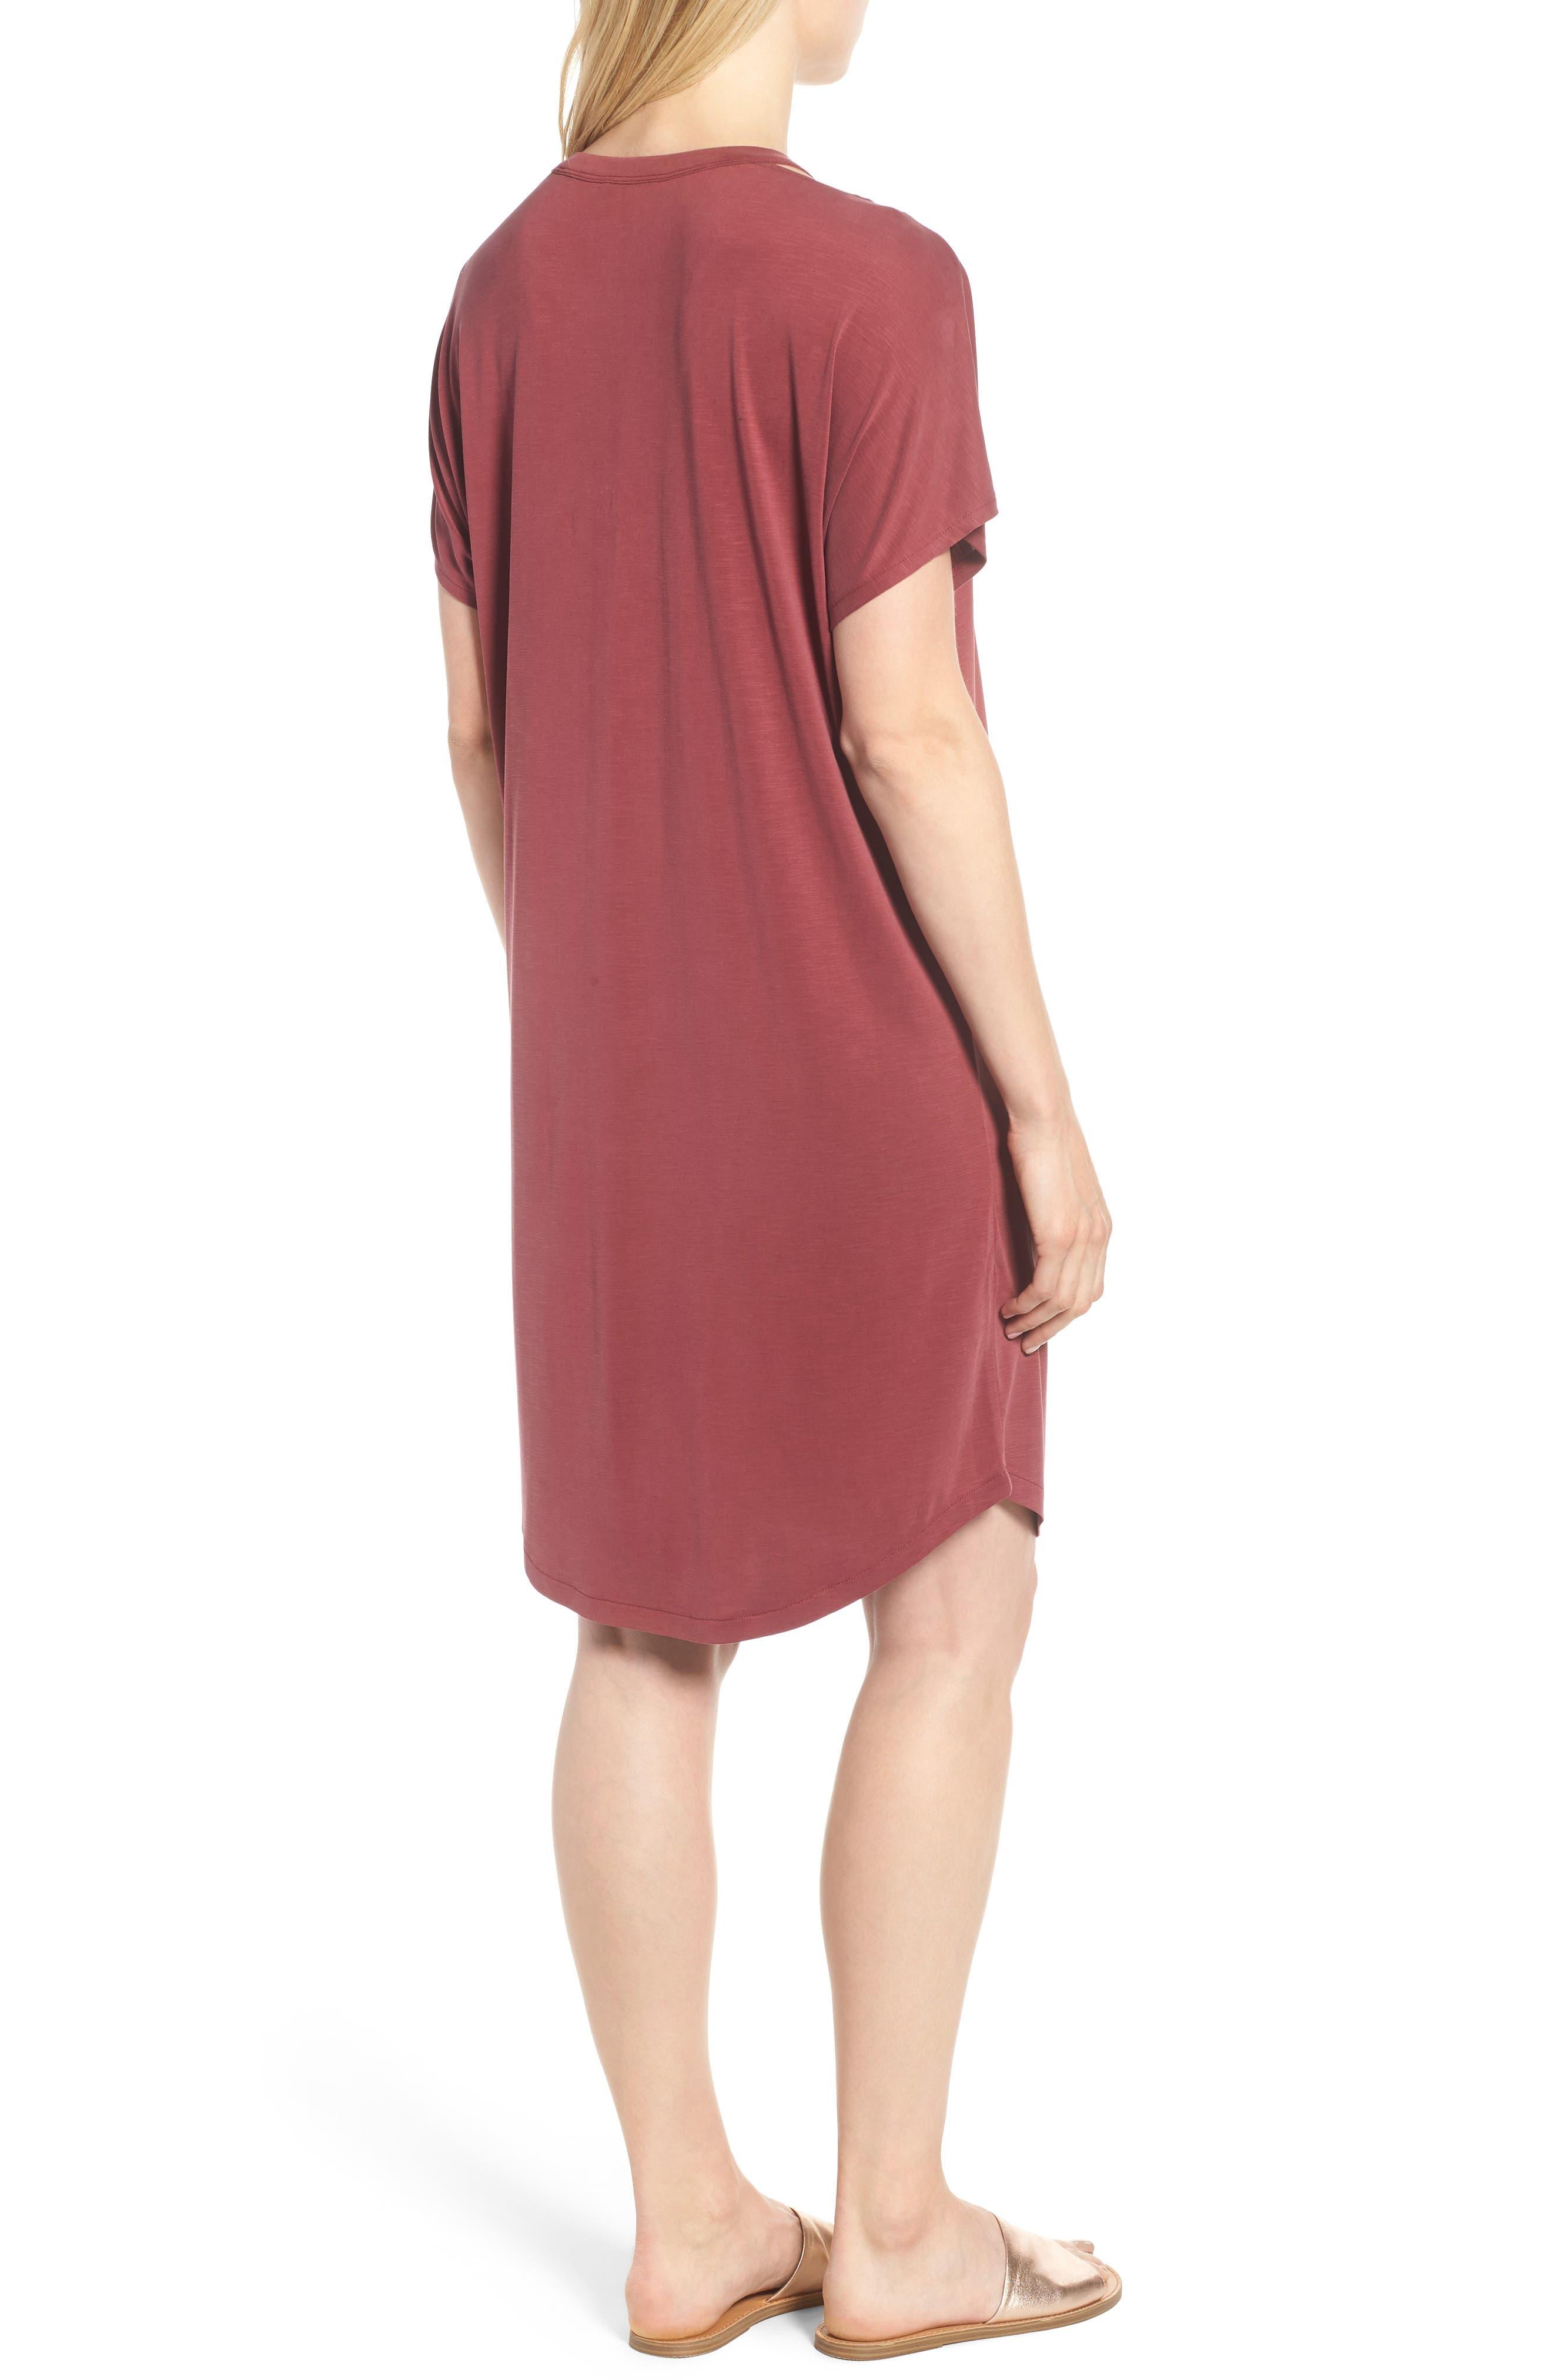 Open Road Dress,                             Alternate thumbnail 2, color,                             Washed Raisin